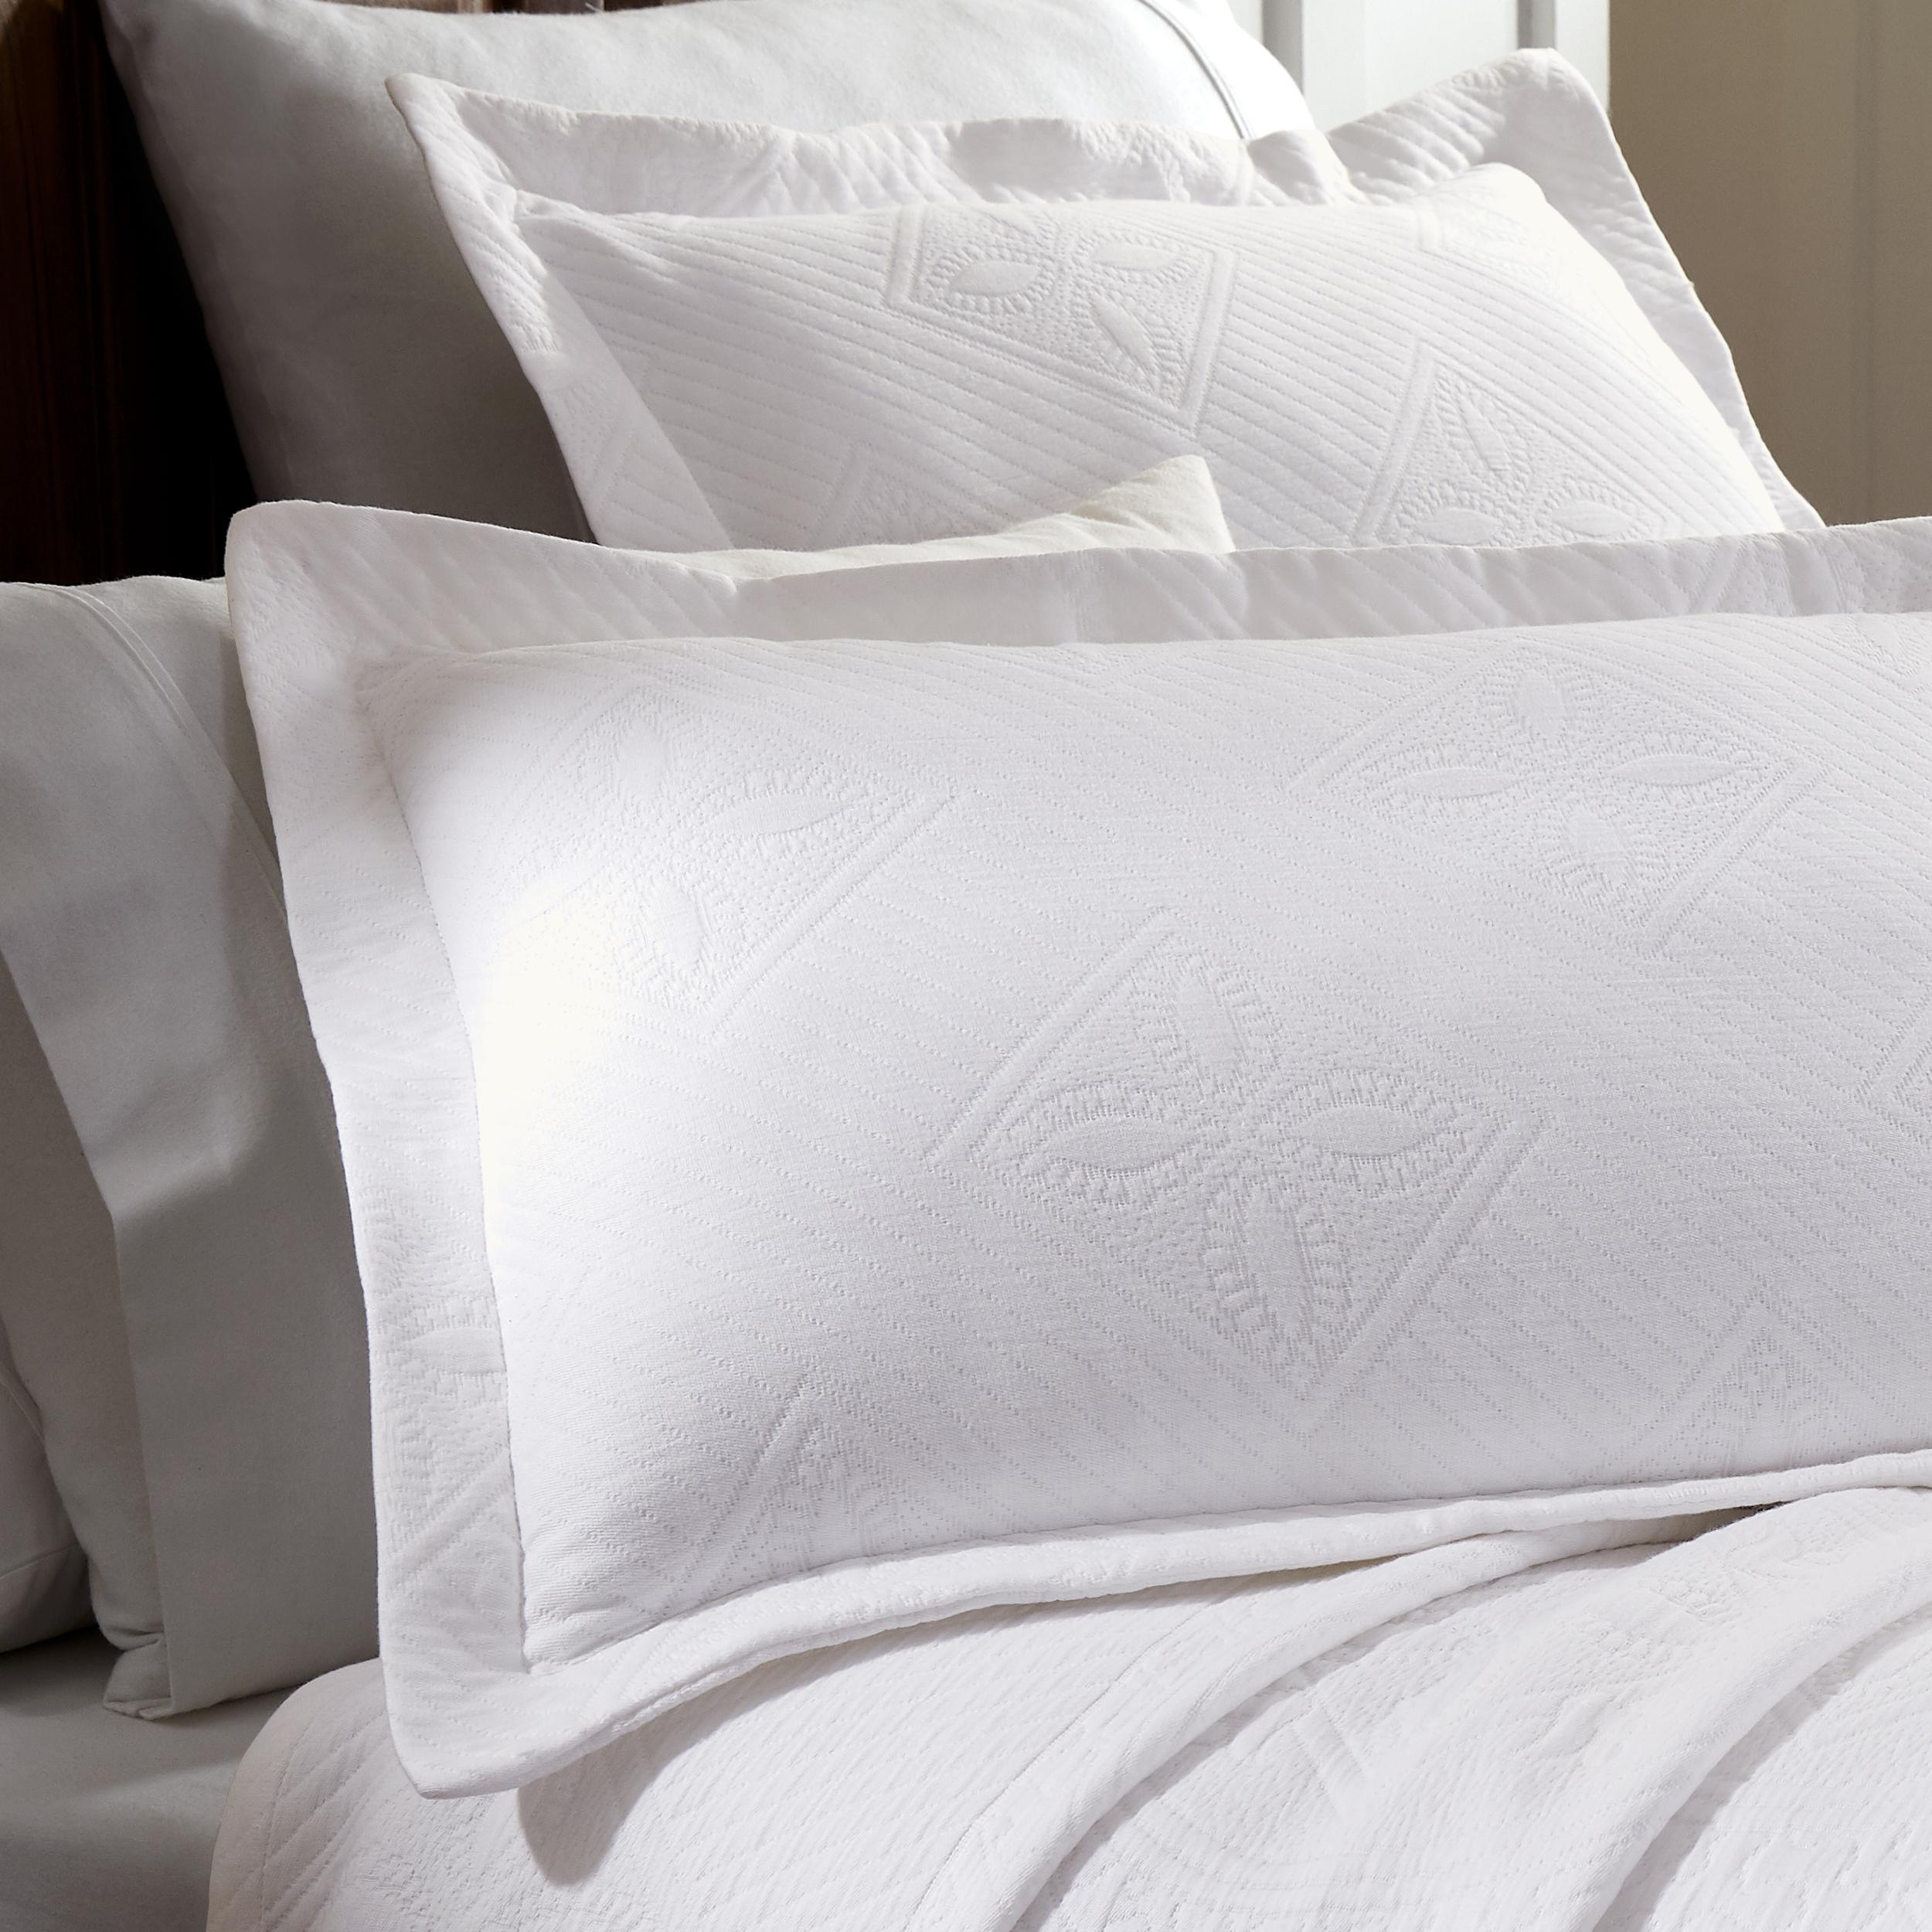 Celtic-Circle-Cotton-Jacquard-Matelasse-Scalloped-Bedspread-Set thumbnail 32